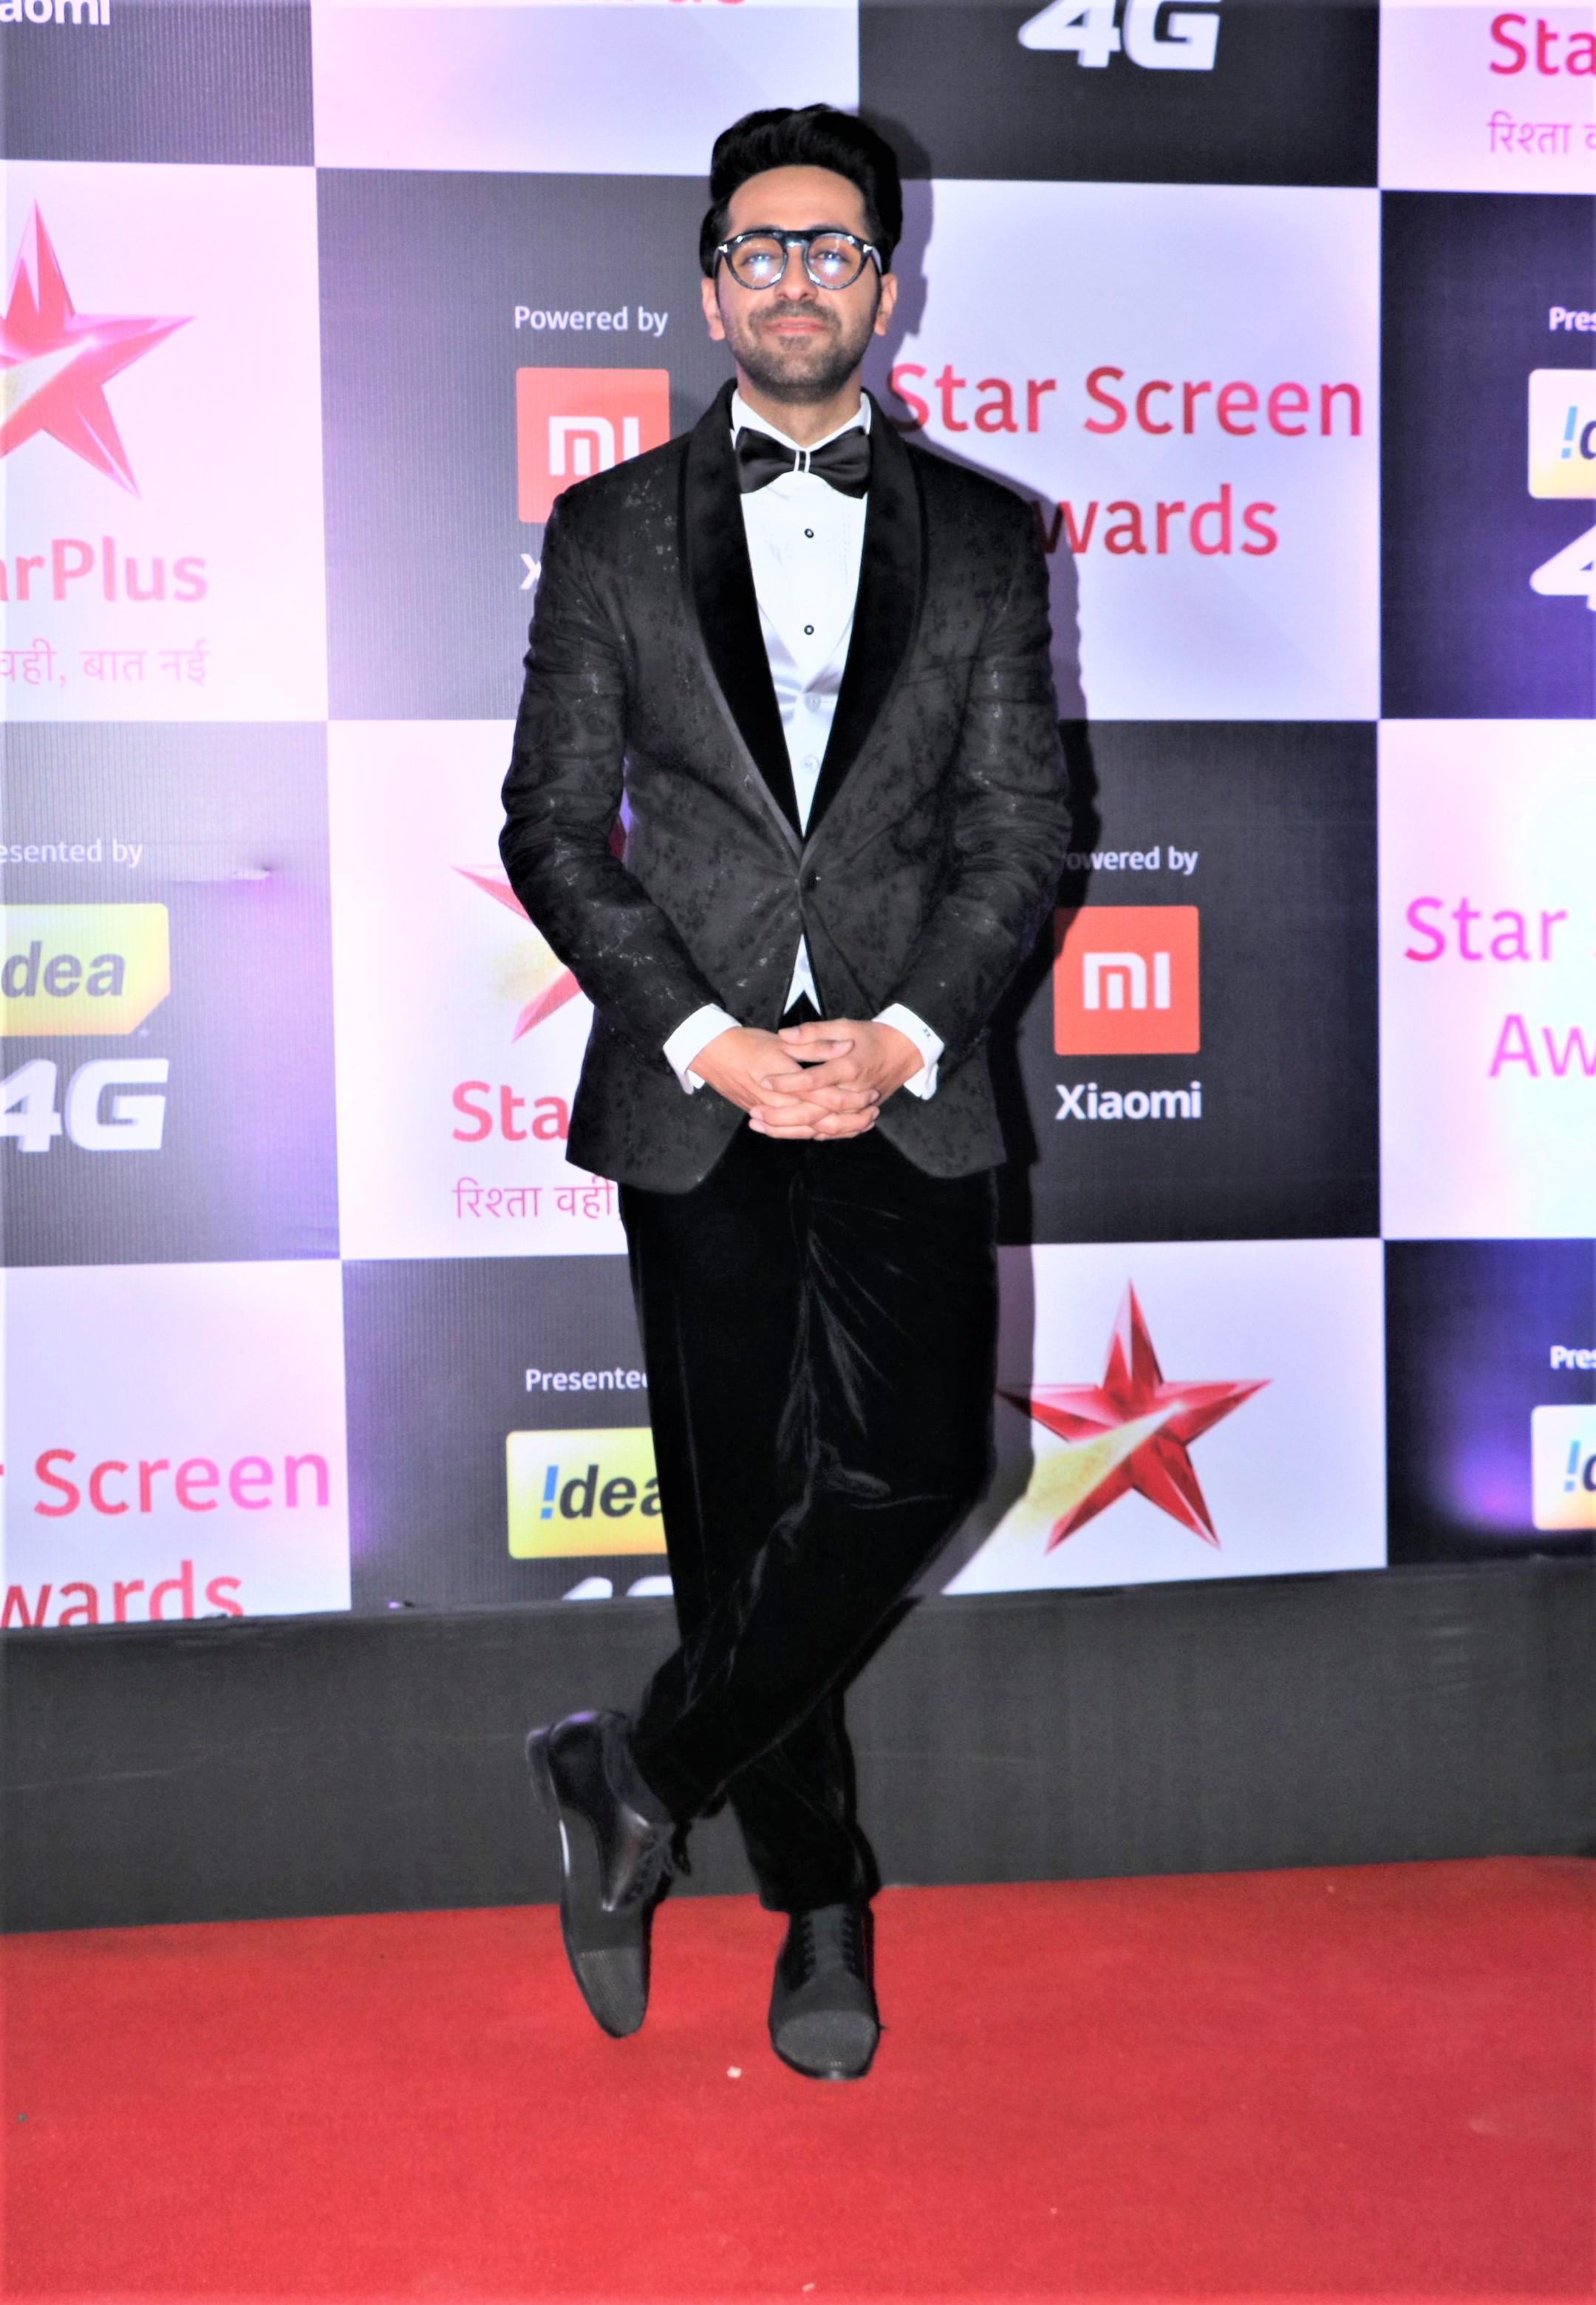 Star Screen Awards: Deepika Padukone-Ranveer Singh, Vicky Kaushal-Ayushmann Khurrana and Alia Bhatt Slay On The Red Carpet